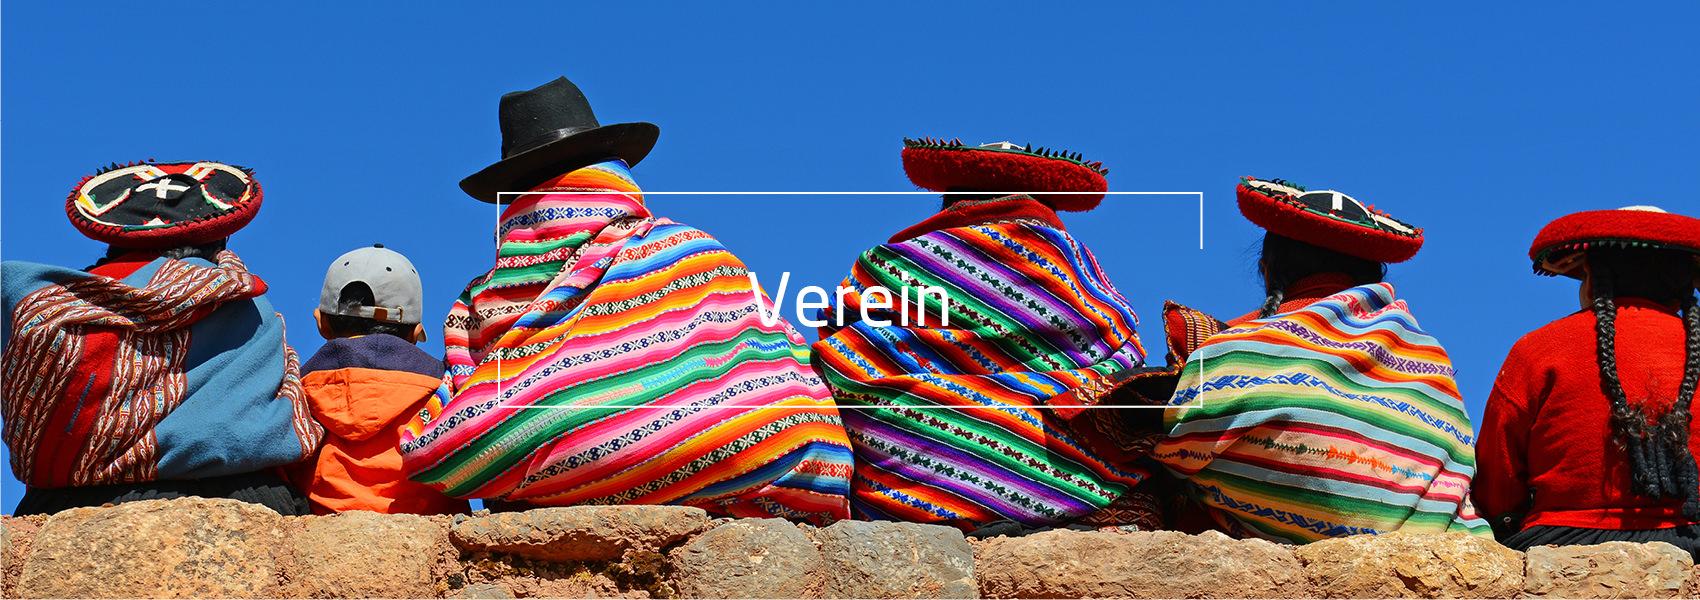 Quechua Frauen, Text: Verein